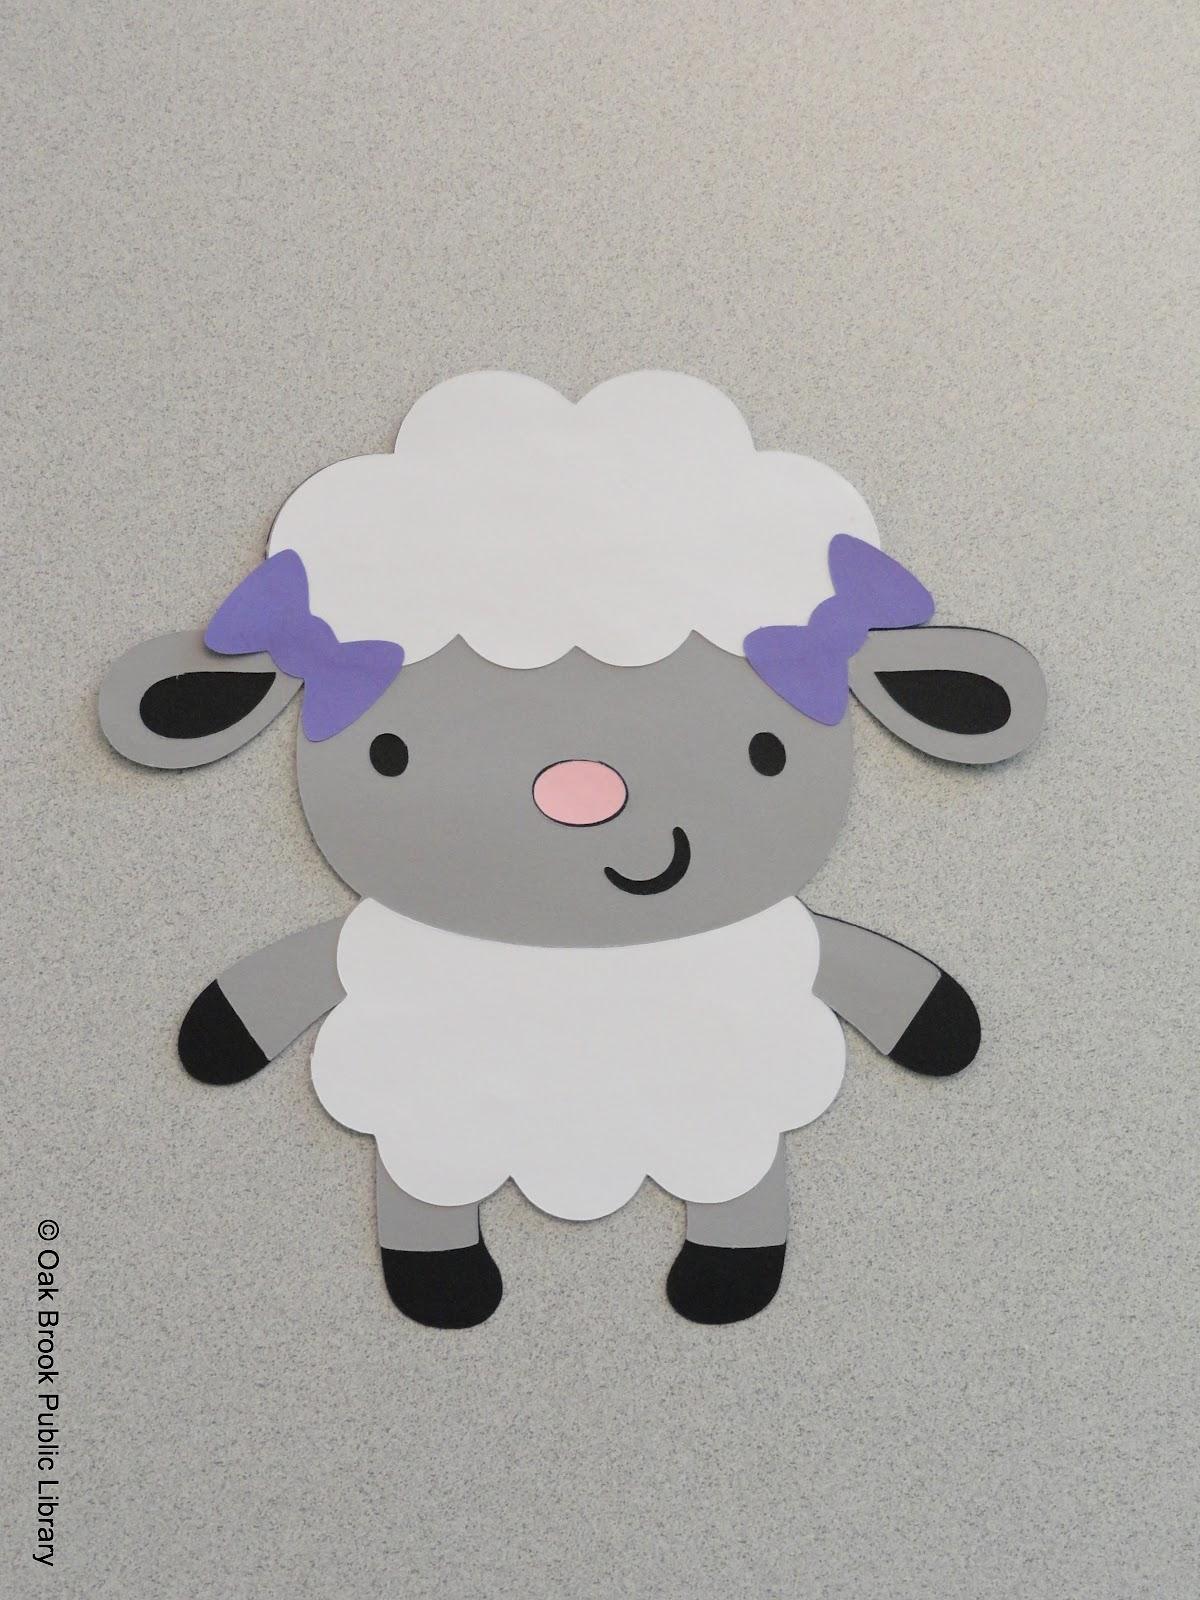 Obpl Youth Services Blog Sheep Sheep Sheep Toddling